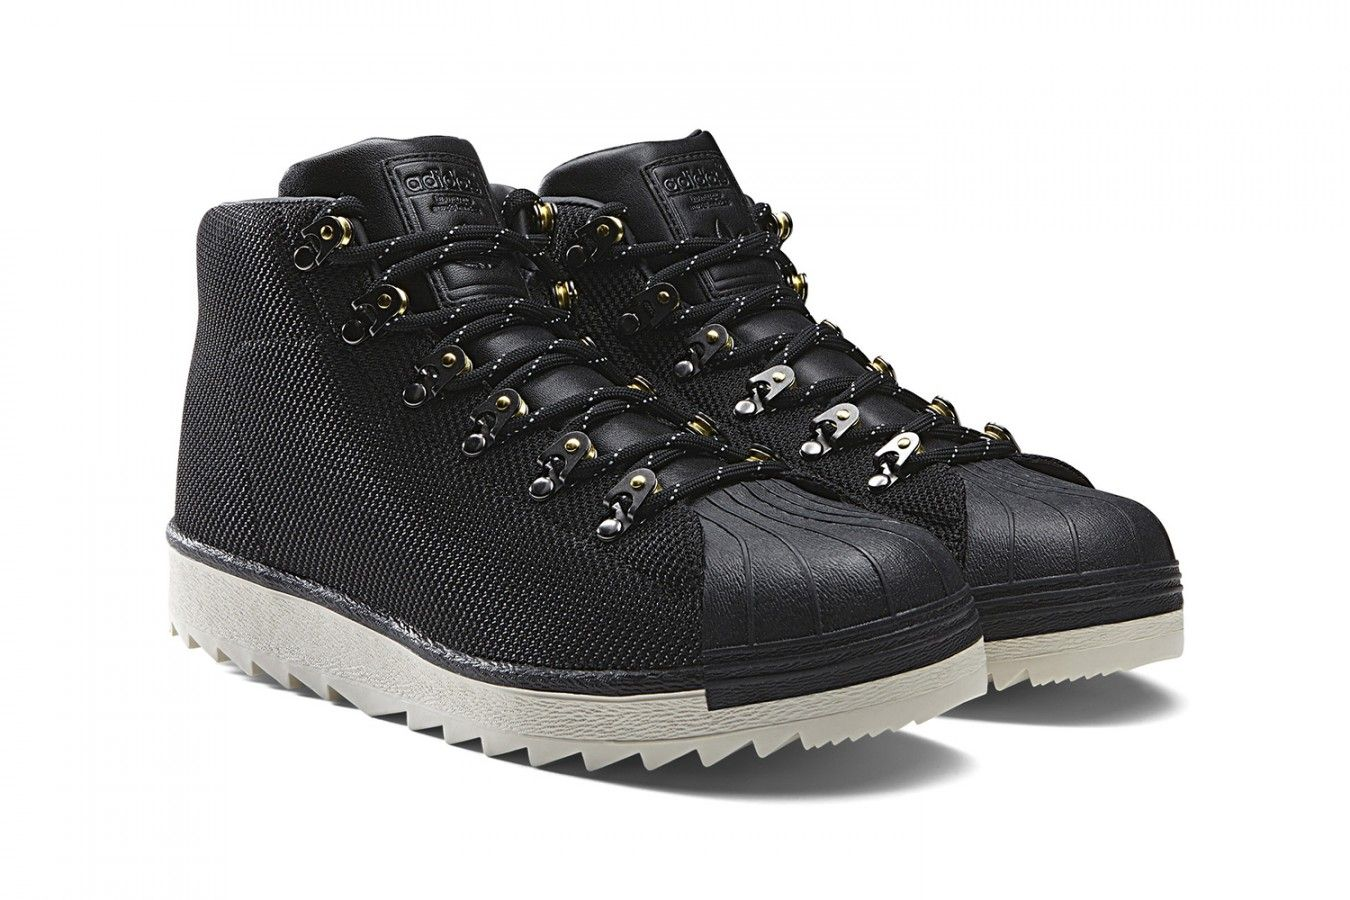 Adidas originali mostra l'inverno pronto (modello gtx adidas